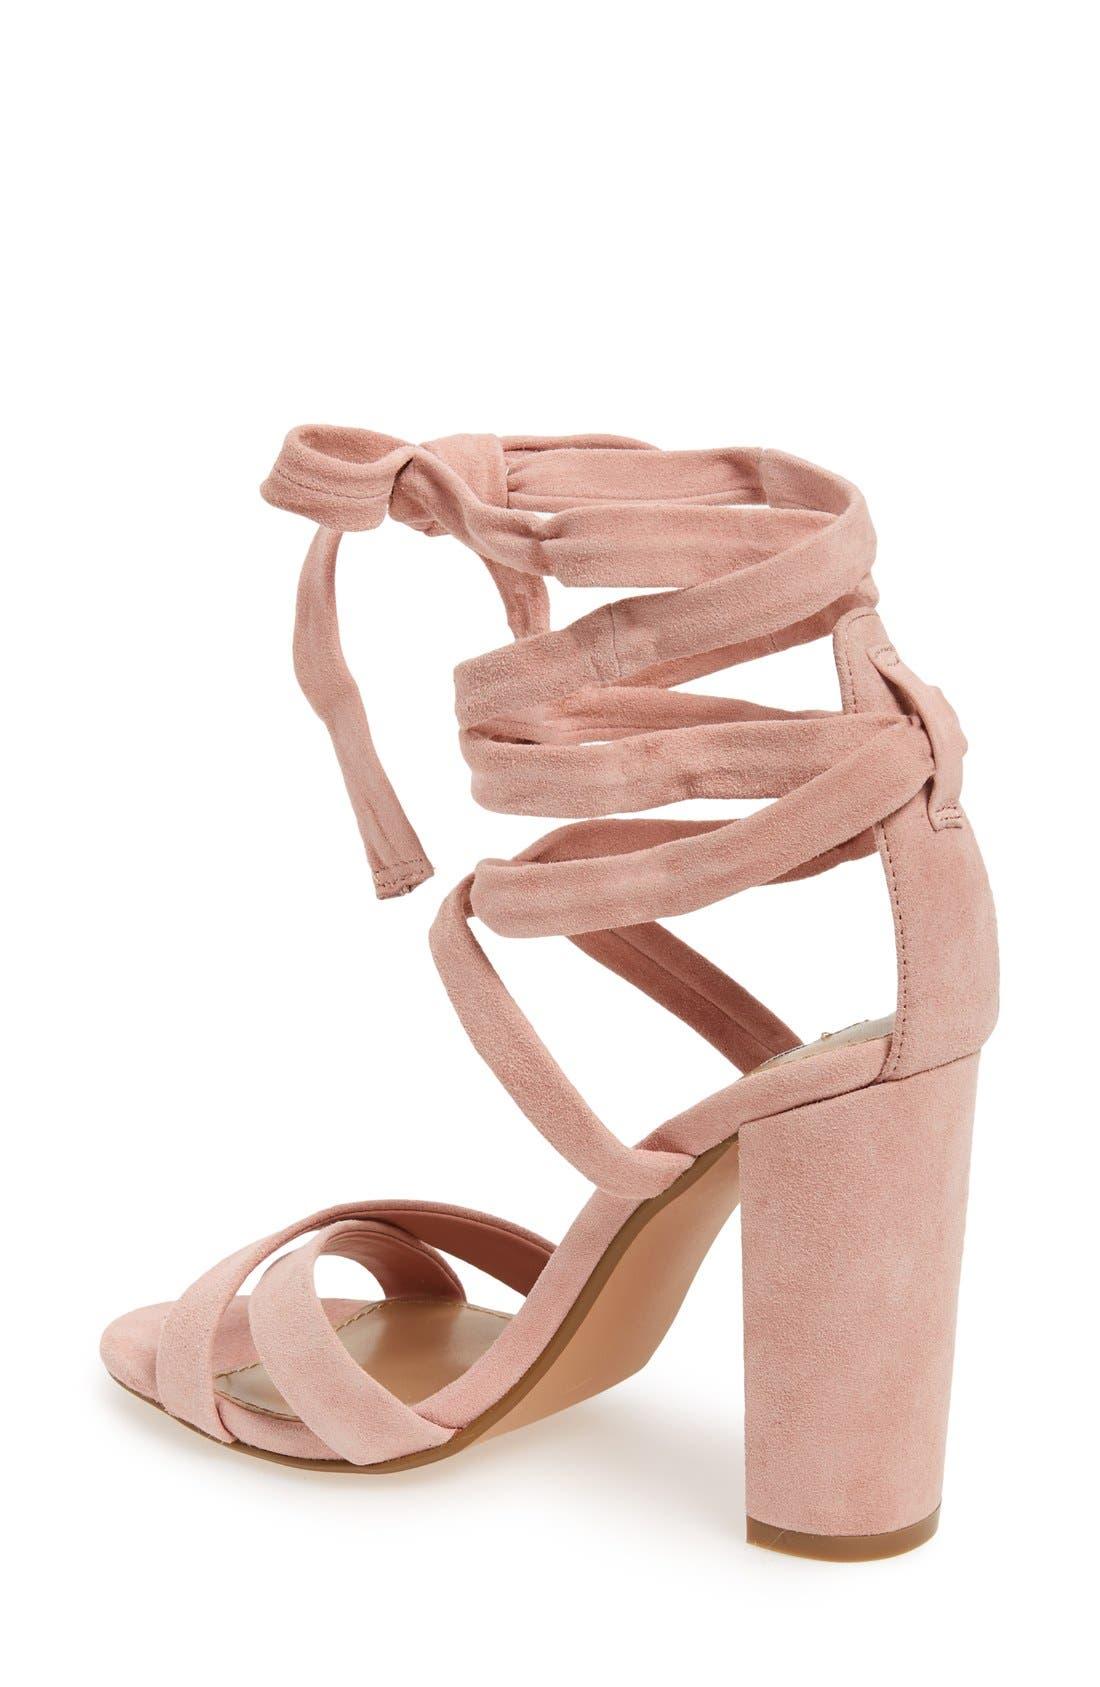 'Christey' Wraparound Ankle Tie Sandal,                             Alternate thumbnail 2, color,                             650